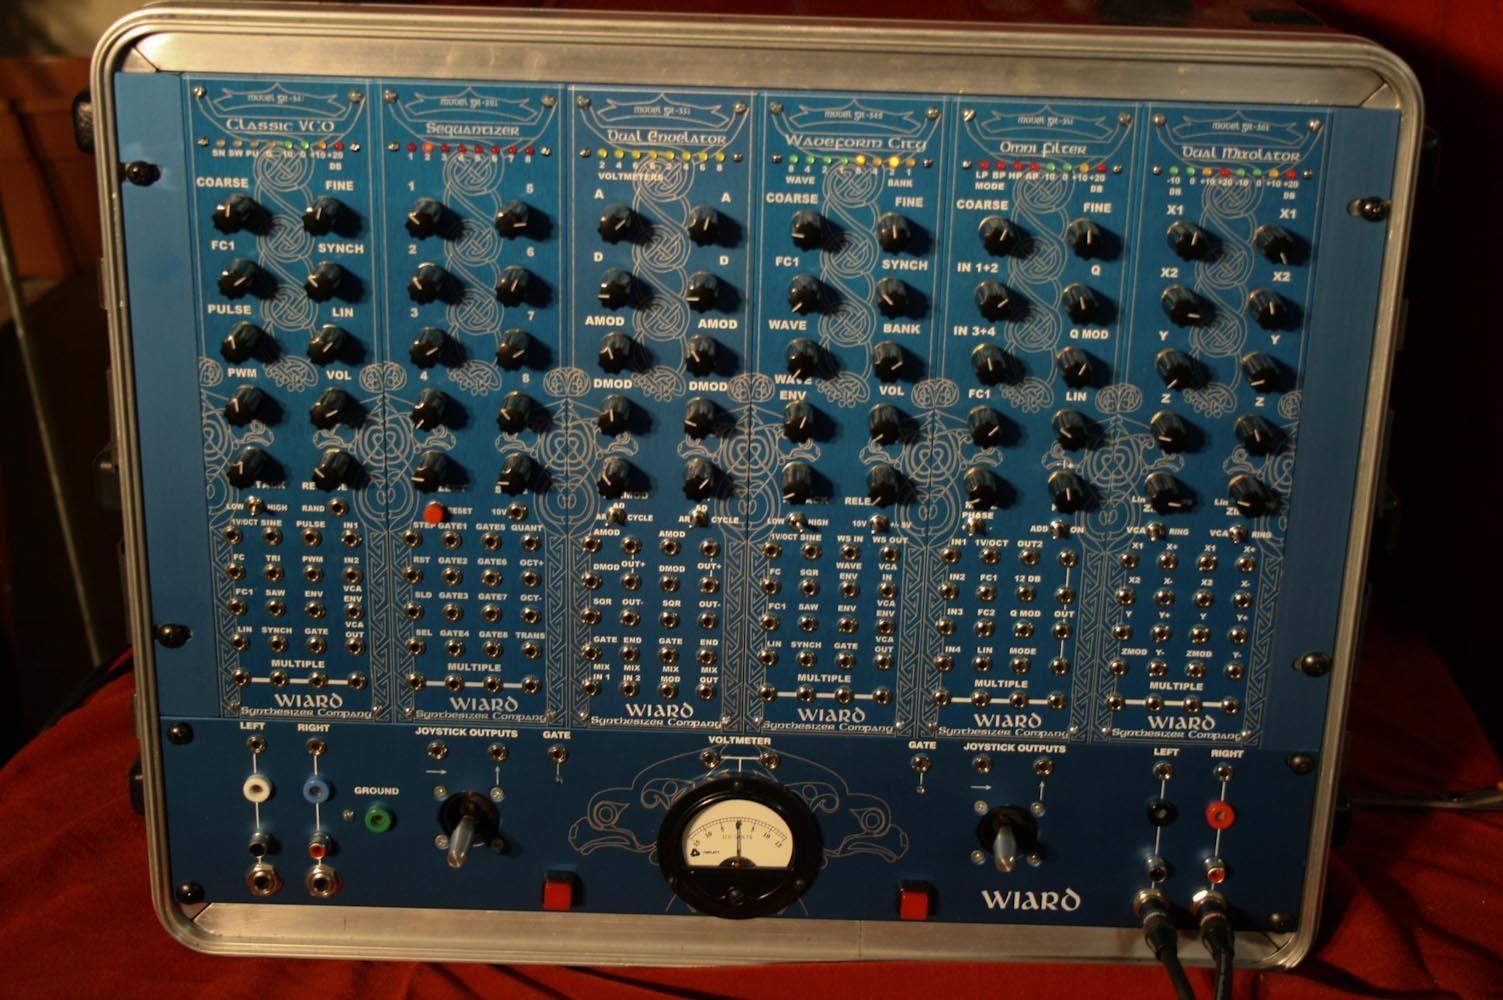 matrixsynth rare wiard series 300 modular synthesizer in 8u skb rack case. Black Bedroom Furniture Sets. Home Design Ideas